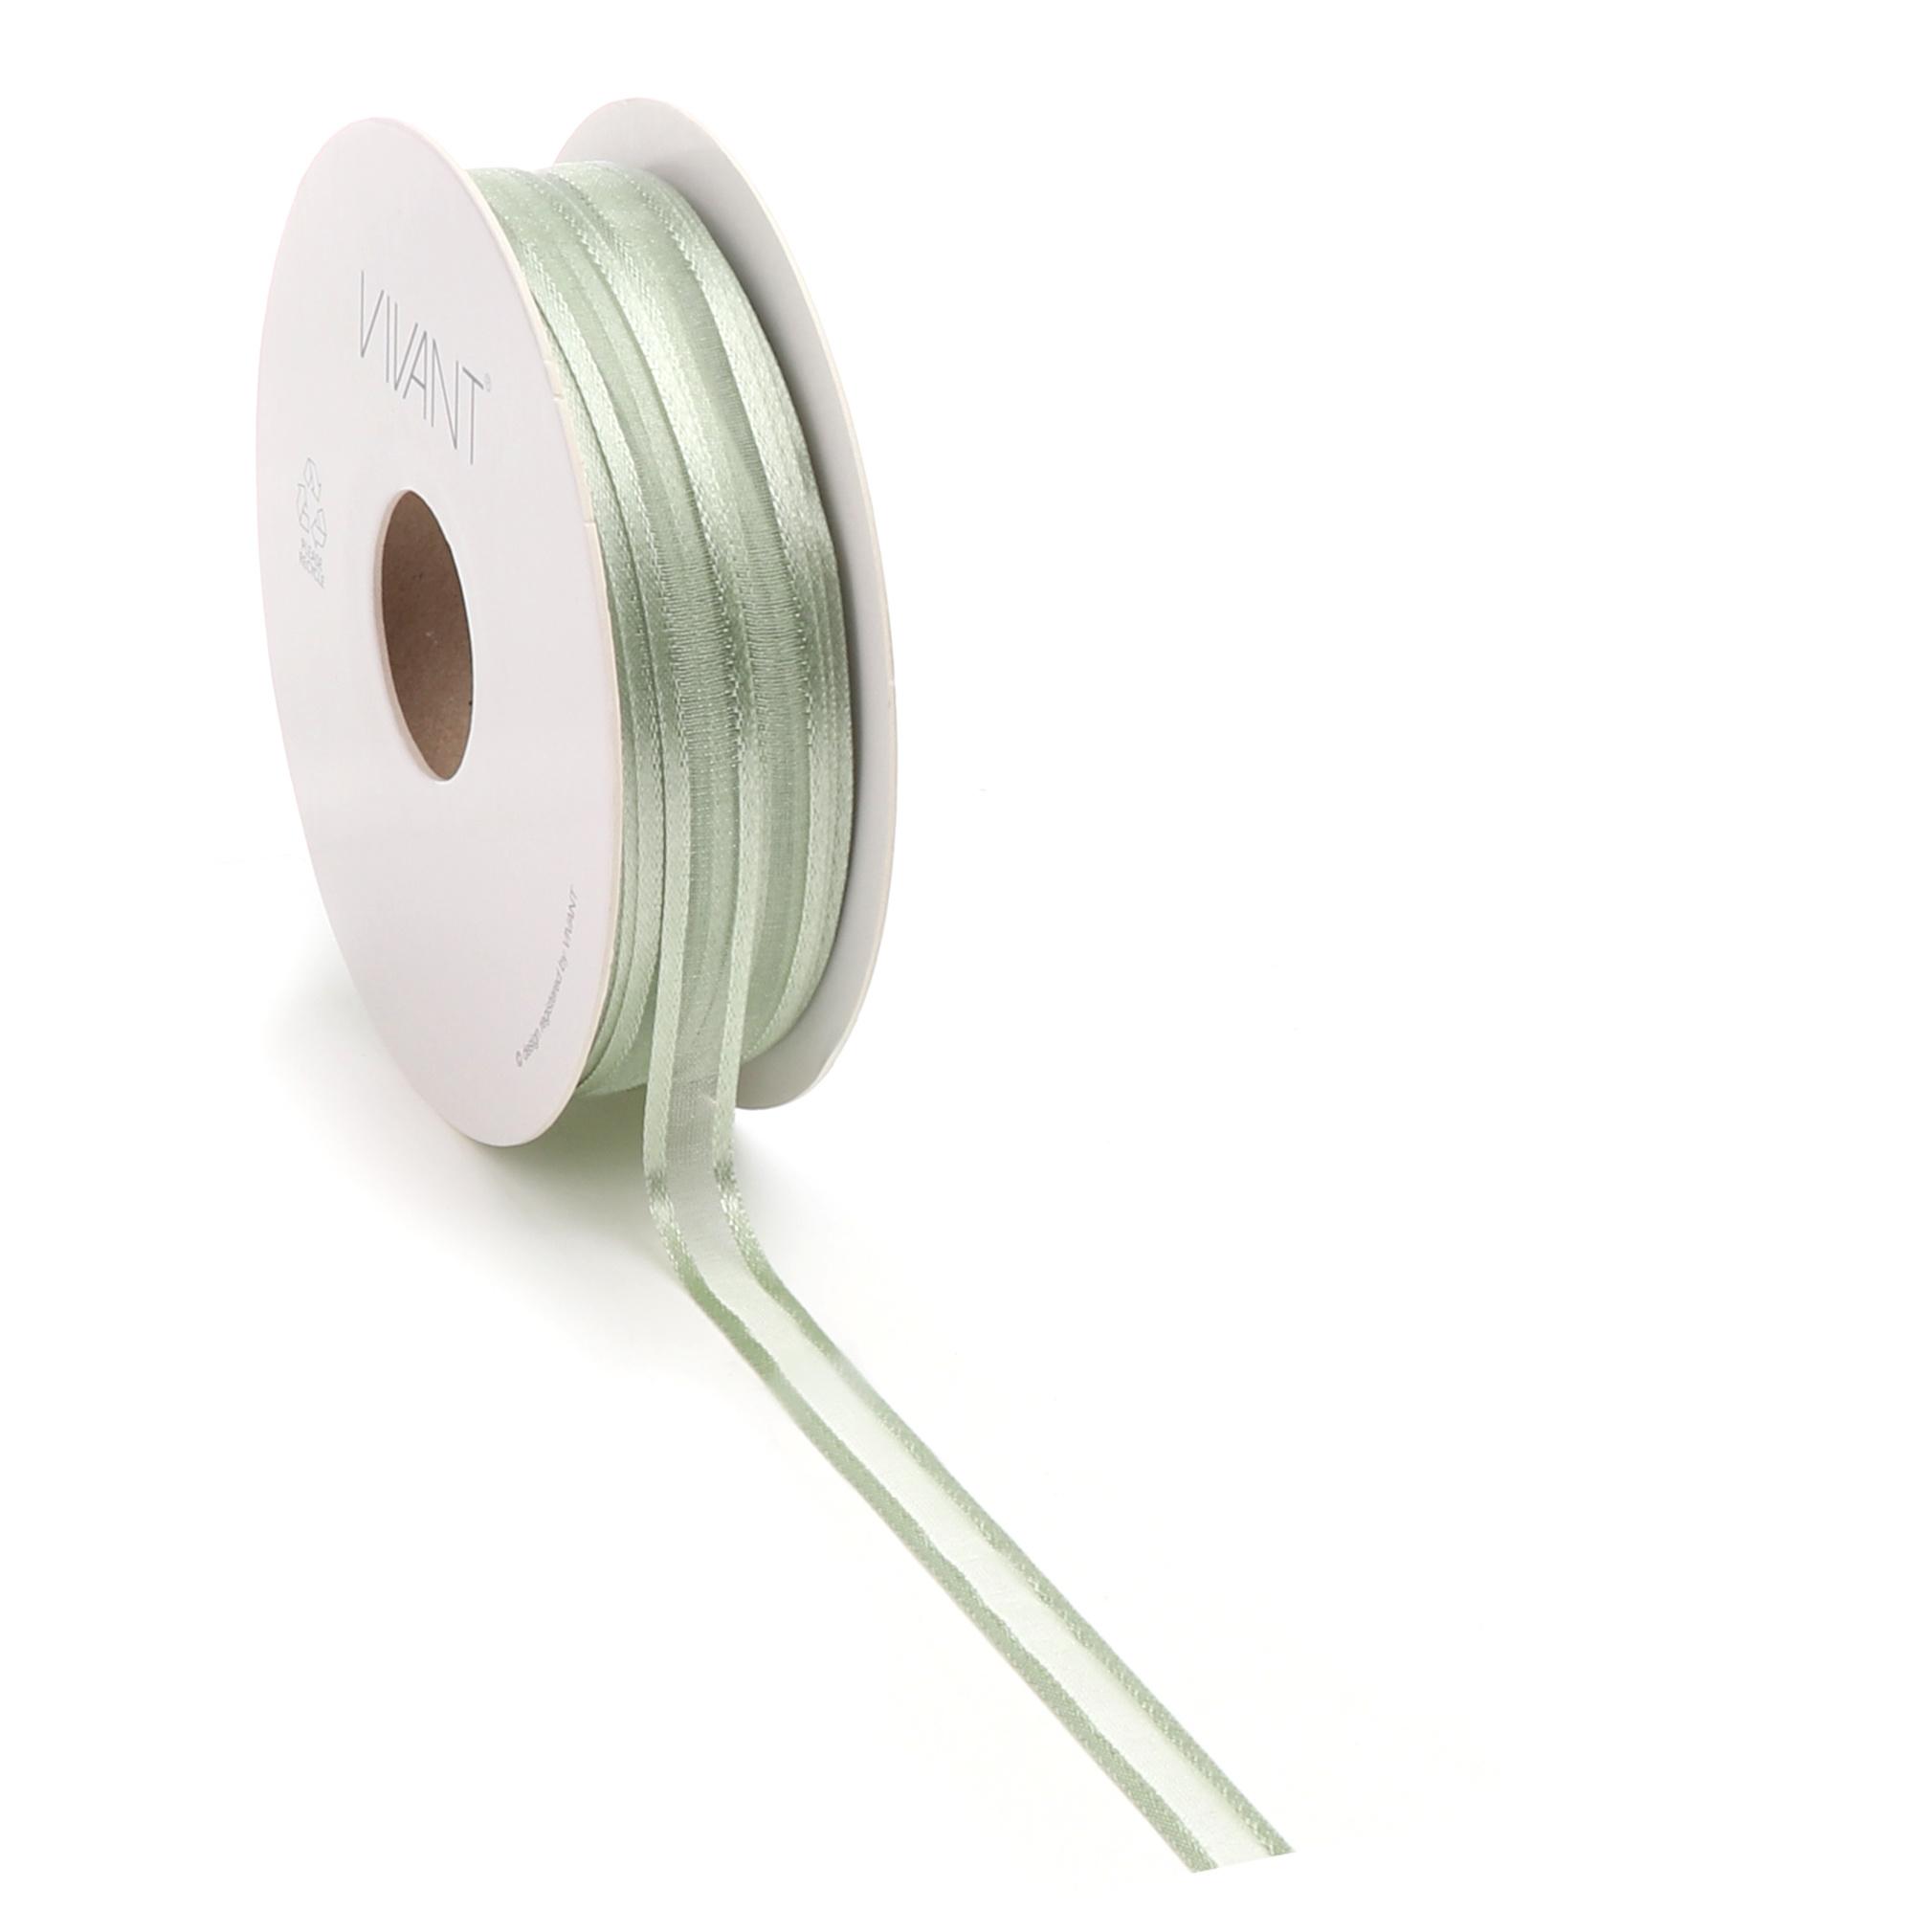 Prego woven edge Ruban - Light Olive